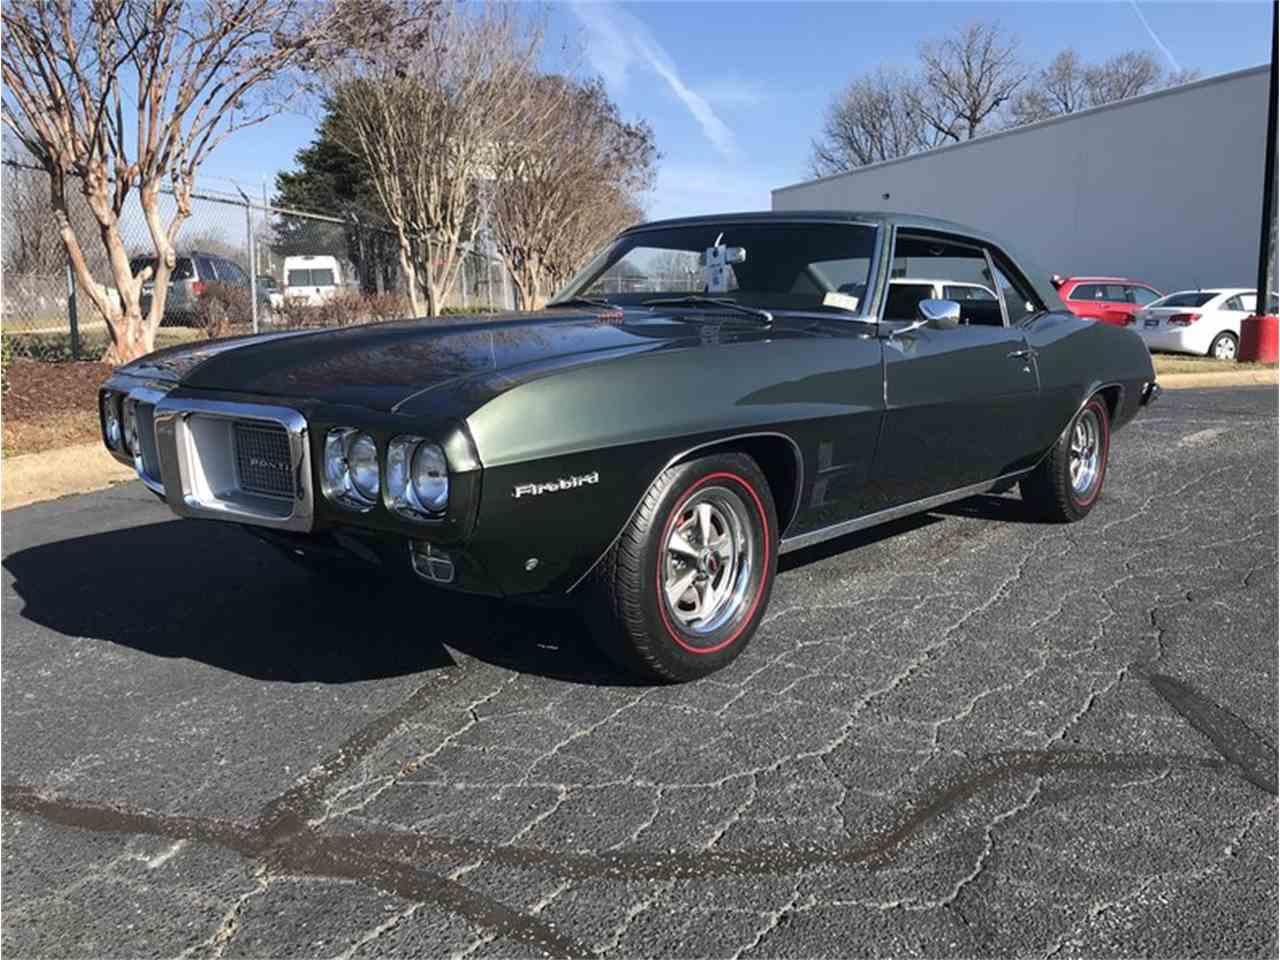 Great List Of Pontiac Cars Photos - Classic Cars Ideas - boiq.info